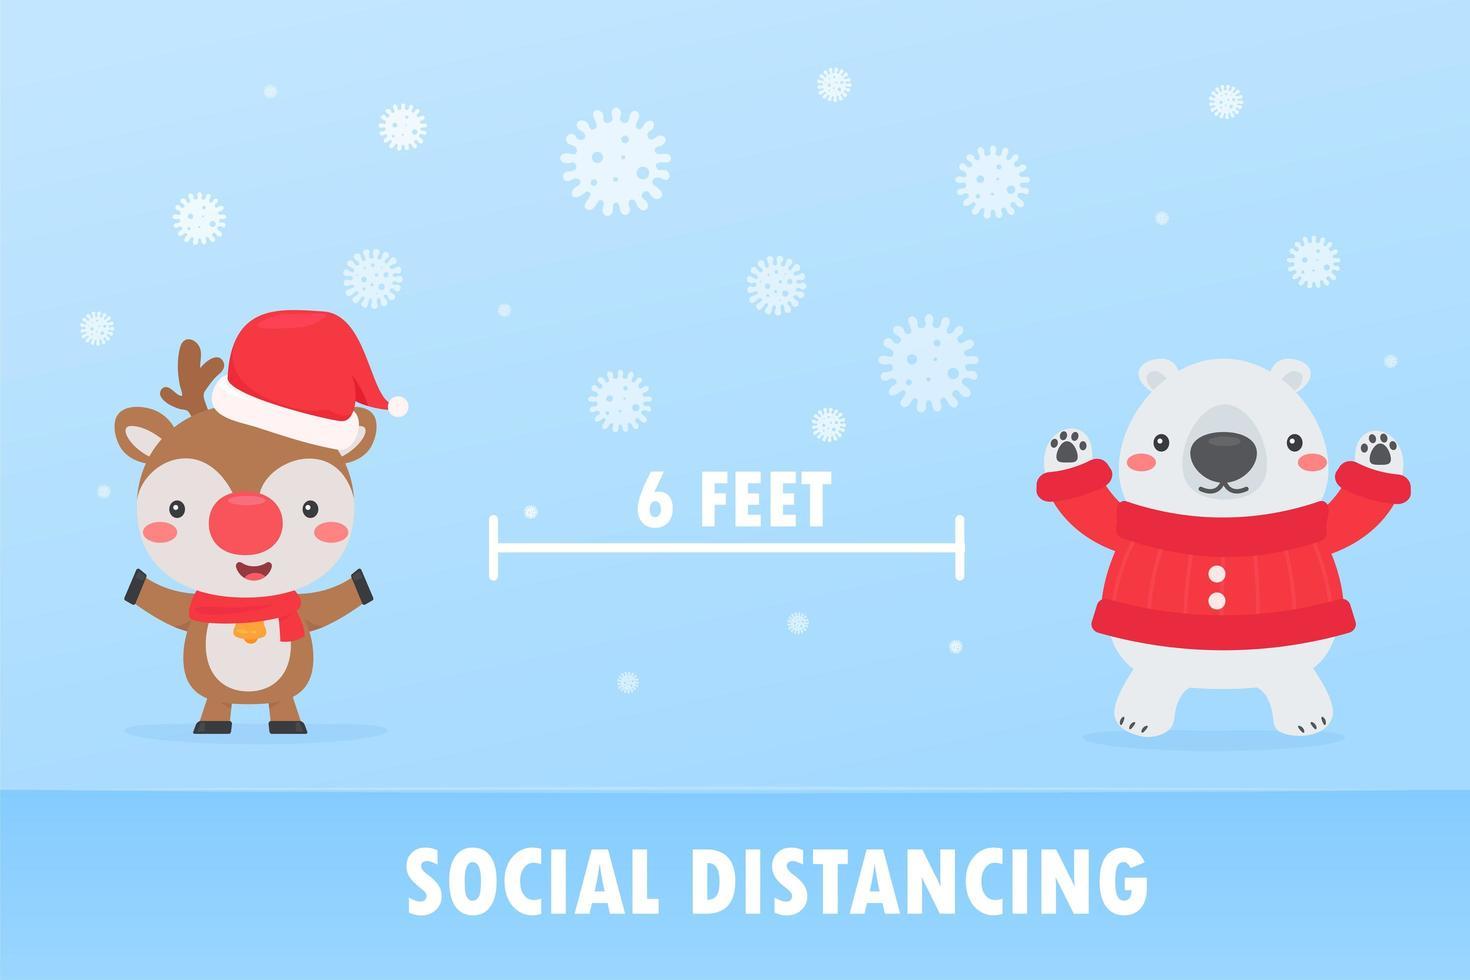 Reindeer and bear social distancing to prevent Coronavirus vector